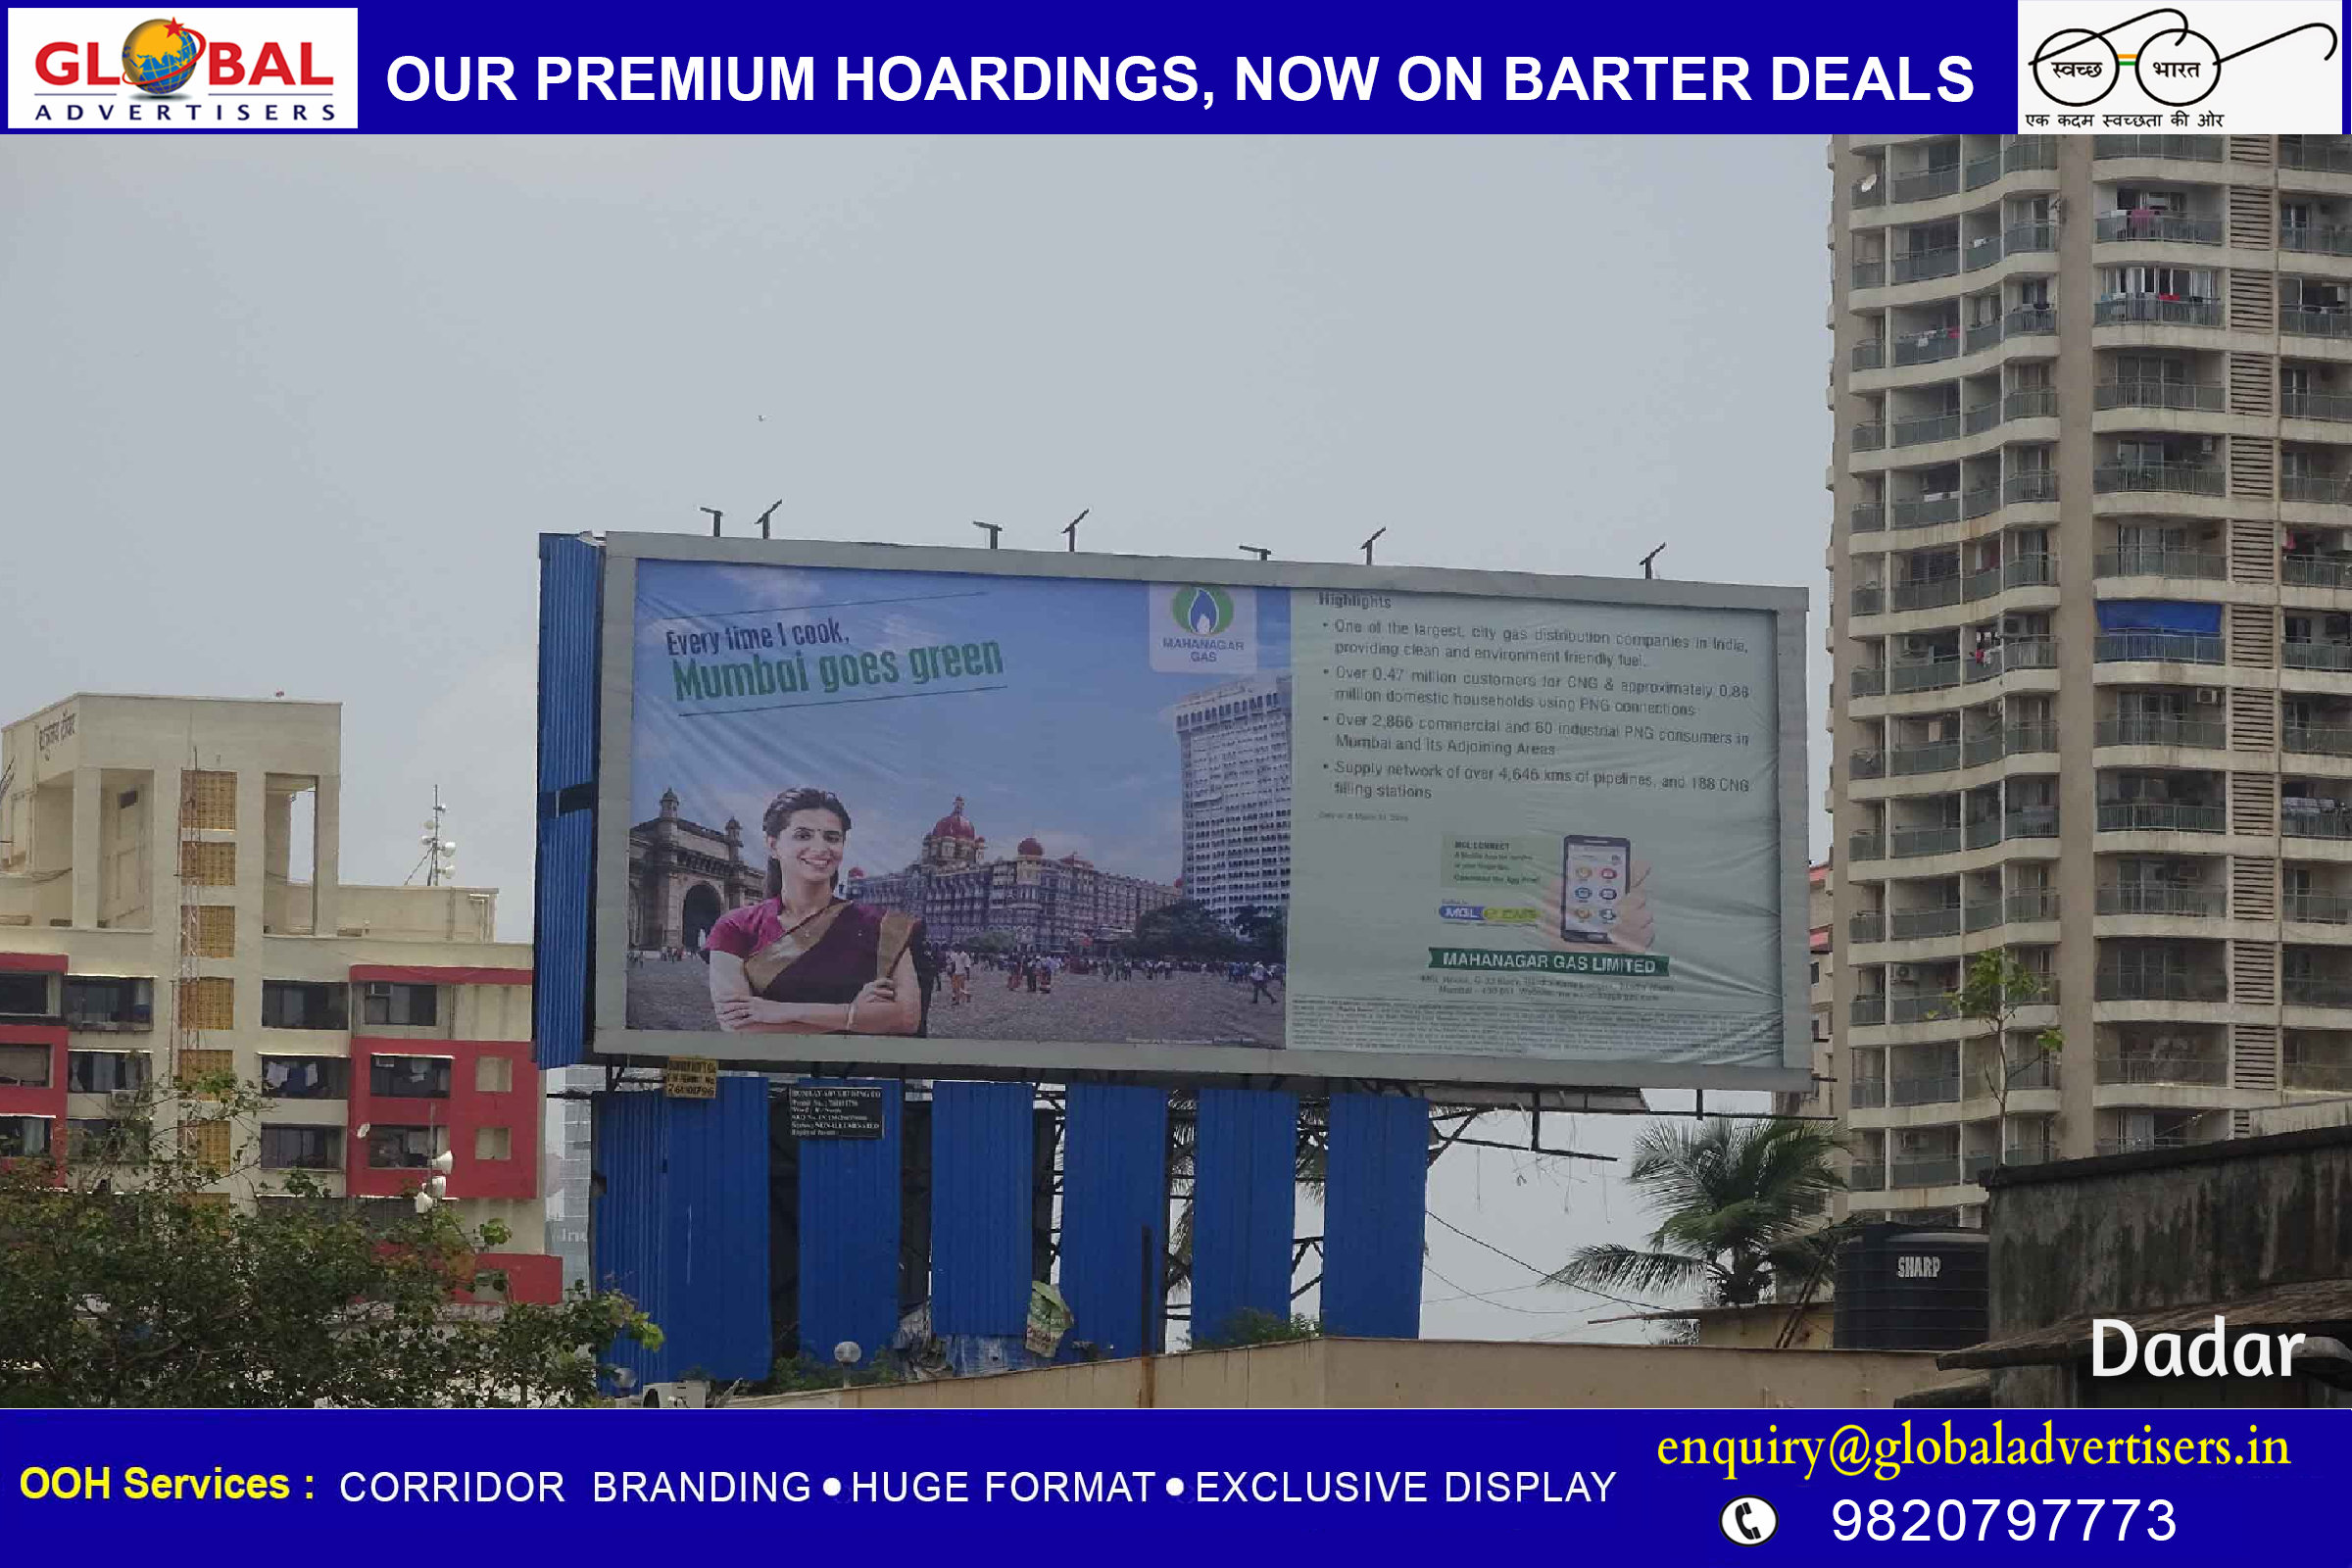 Mahanagar Gas Limited Mgl Kick Started Their Outdoor